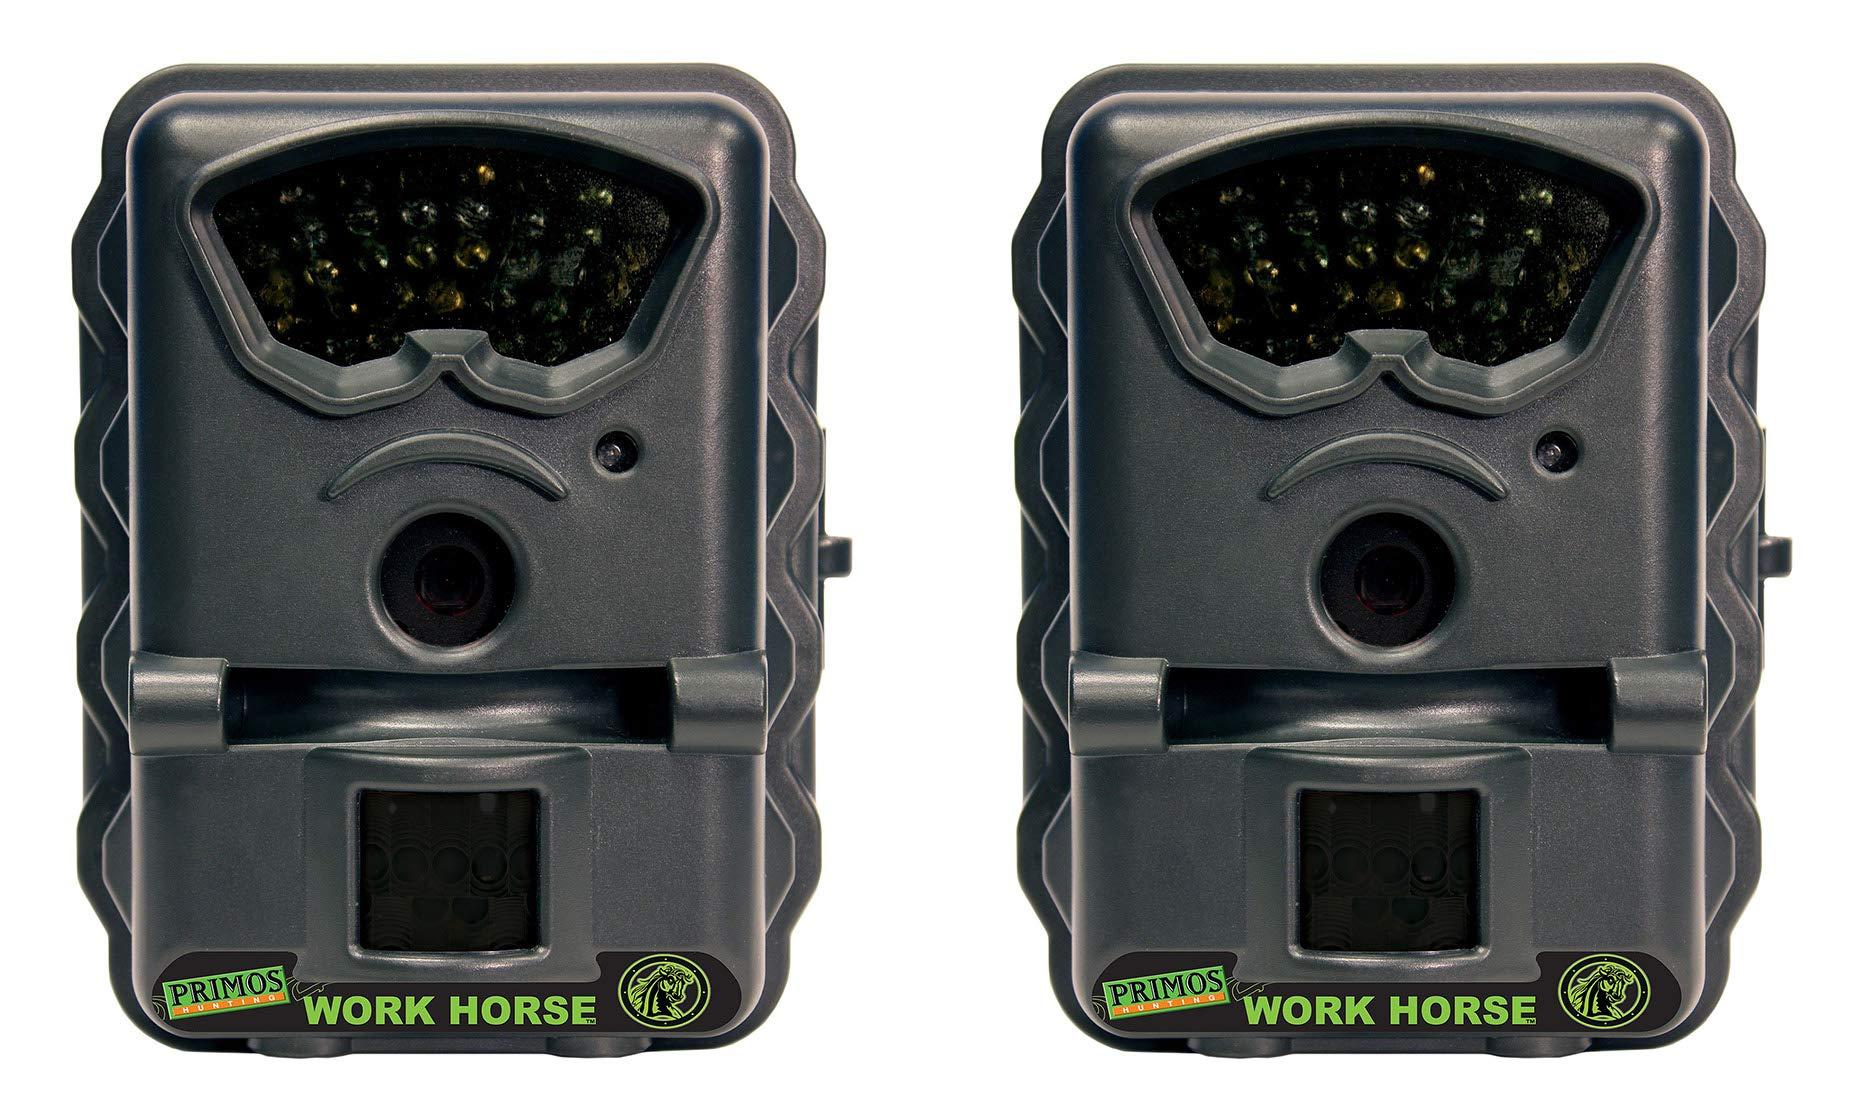 Primos Work Horse 3MP Infrared Trail Camera (Certified Refurbished) (2 Pack)